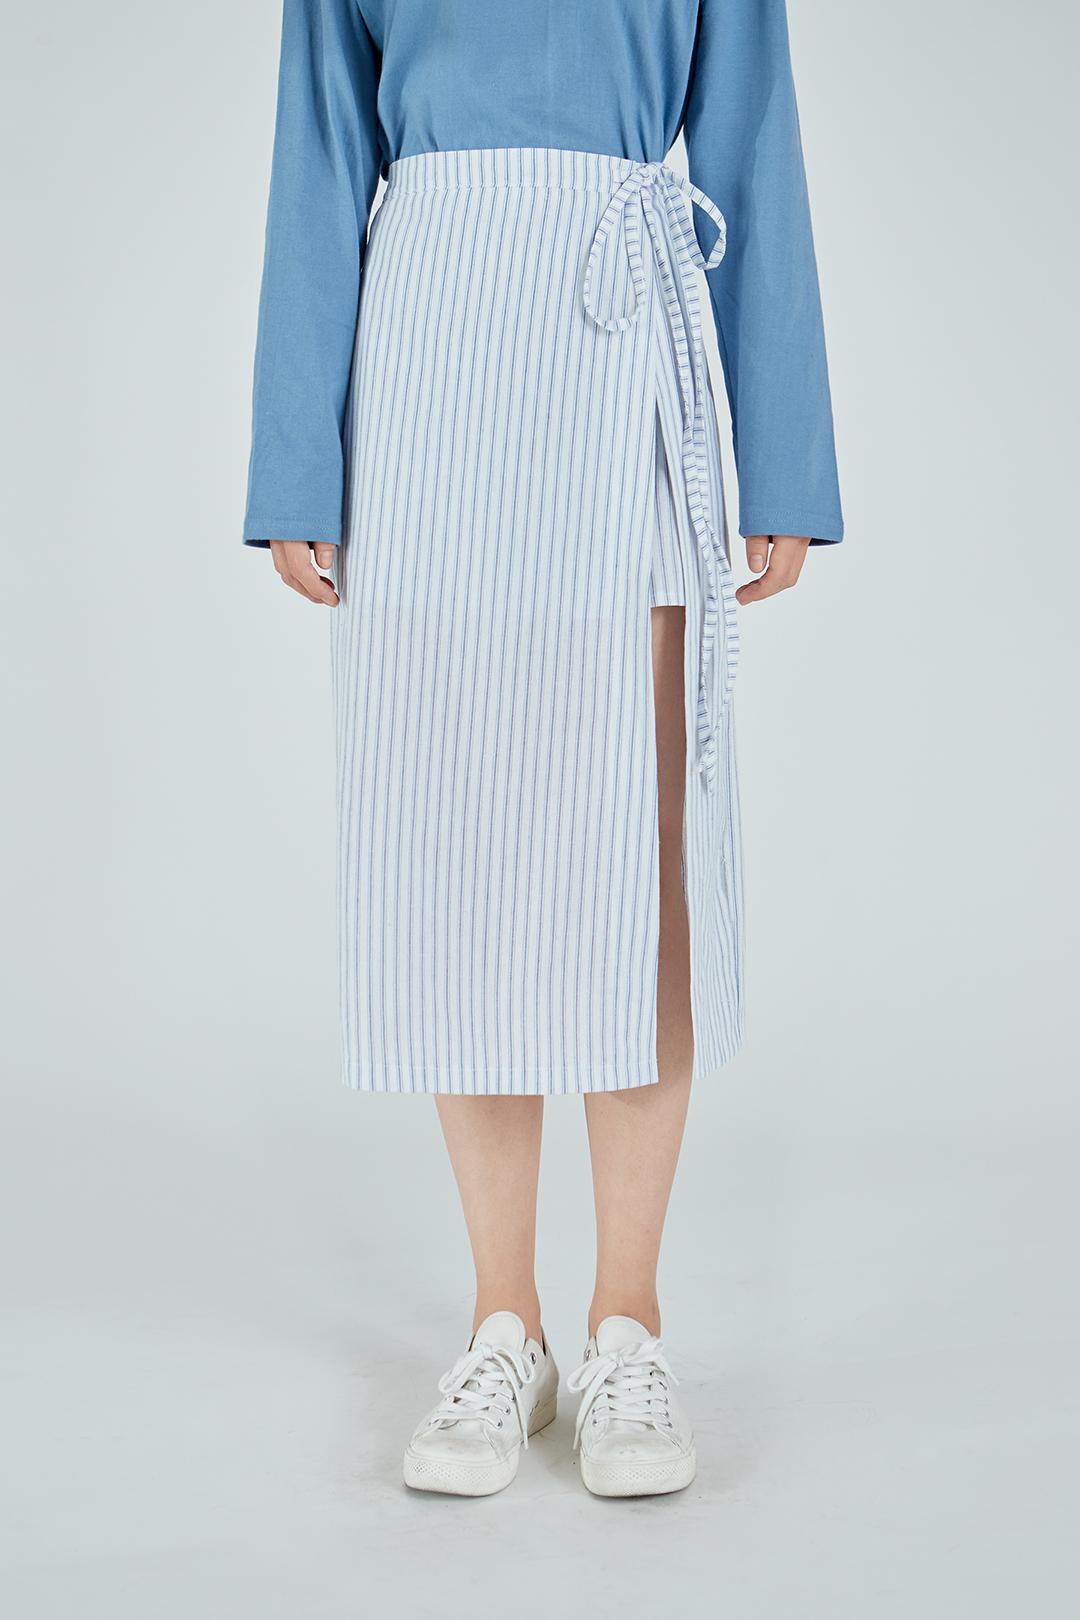 Unbalanced Striped Long Skirt